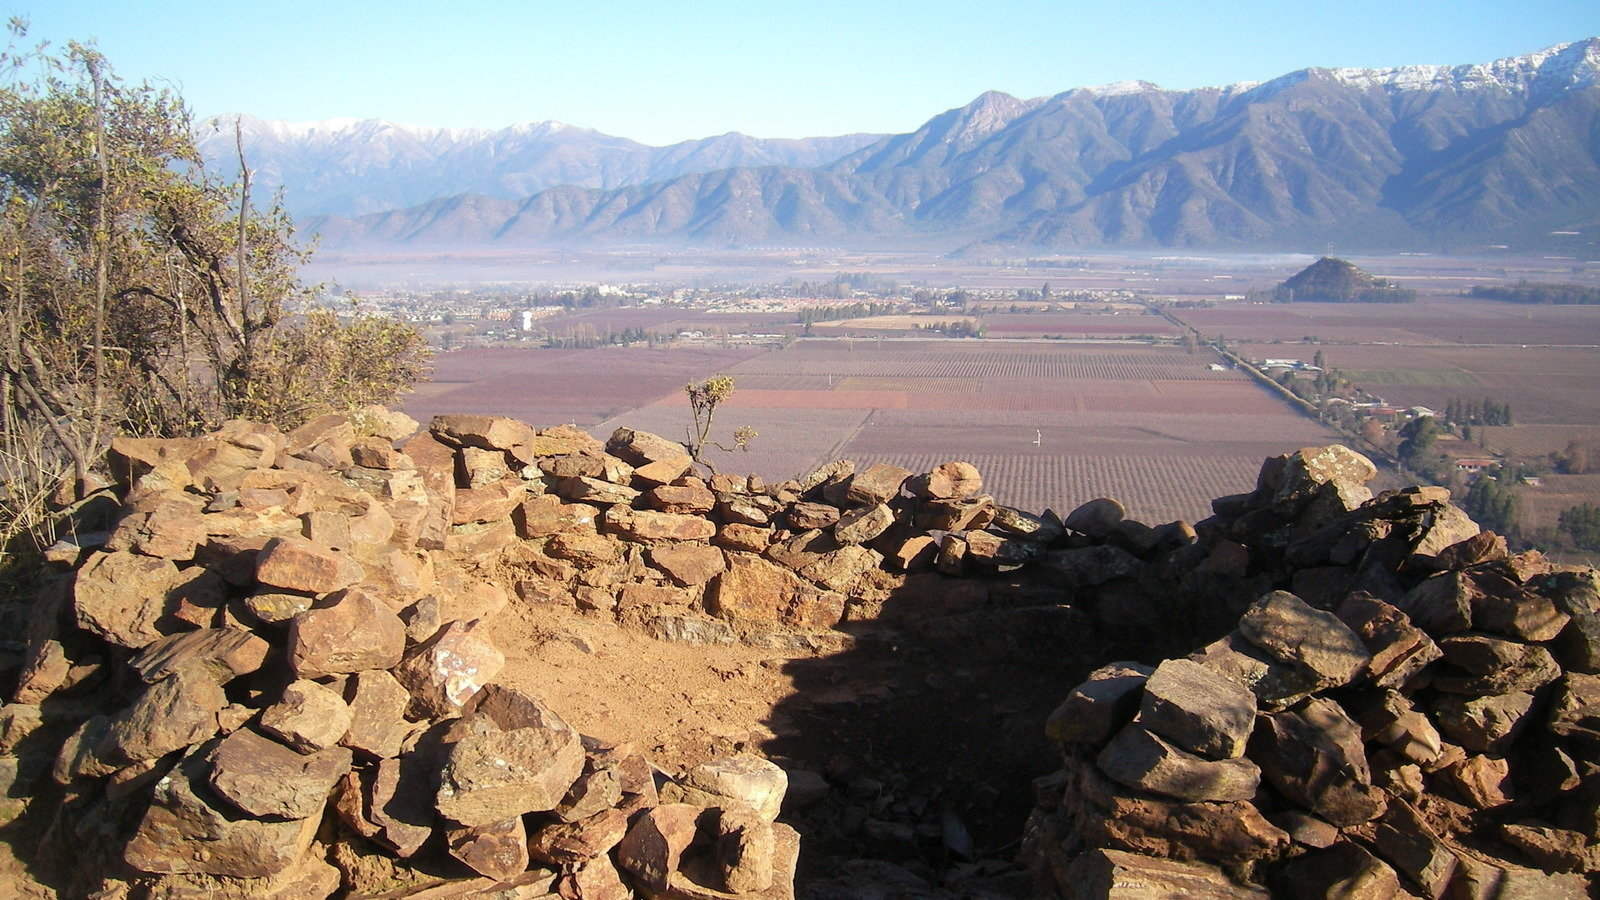 Petition · Restore and protect the Pukara Inca ruins near..